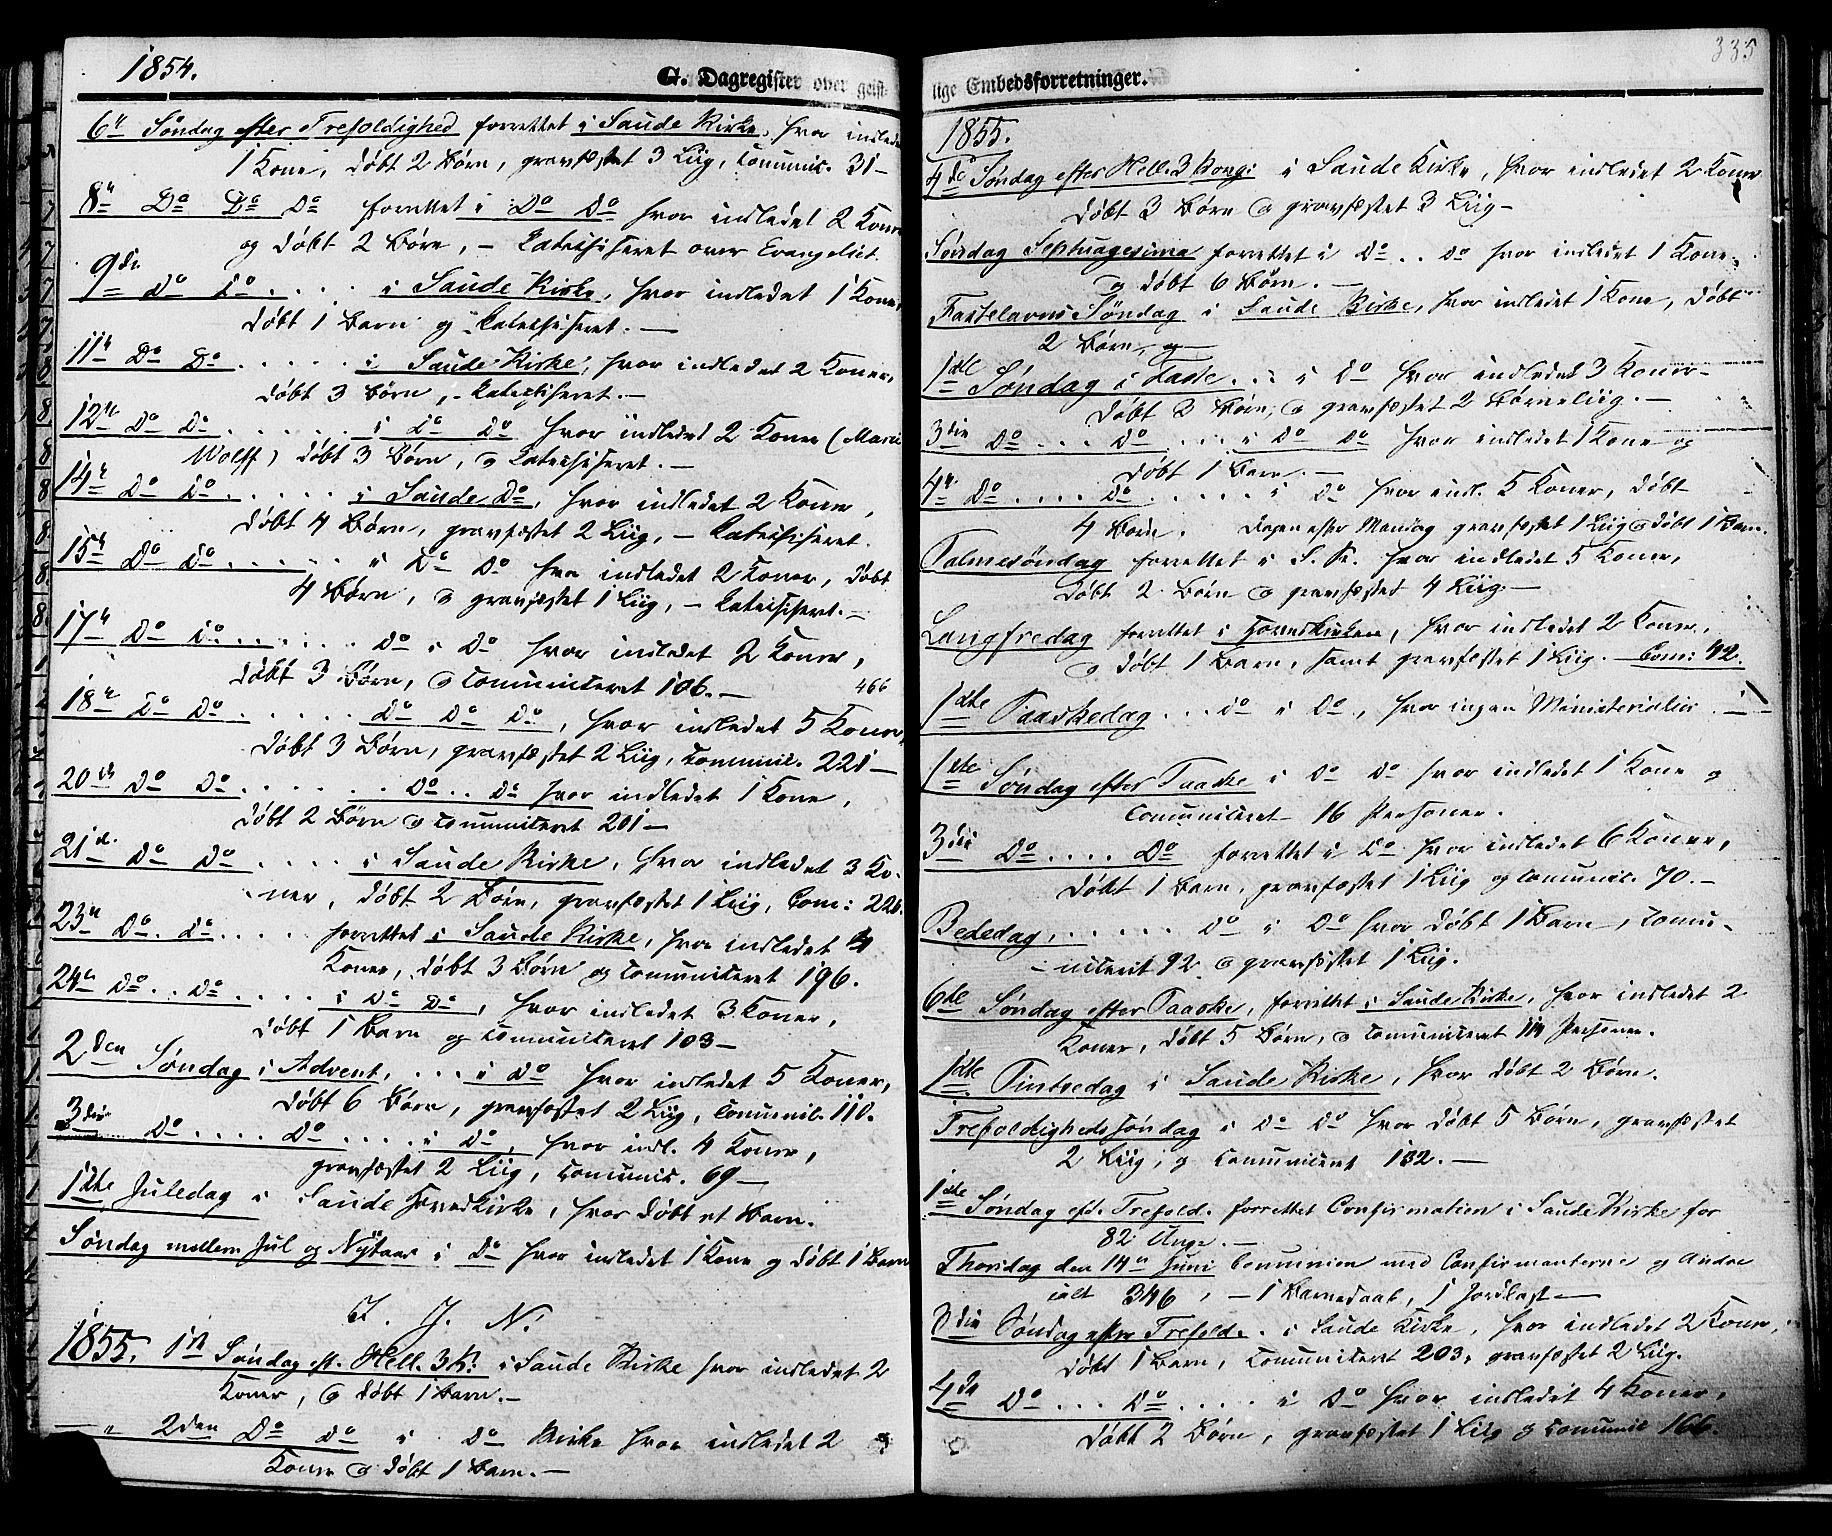 SAKO, Sauherad kirkebøker, F/Fa/L0007: Ministerialbok nr. I 7, 1851-1873, s. 335